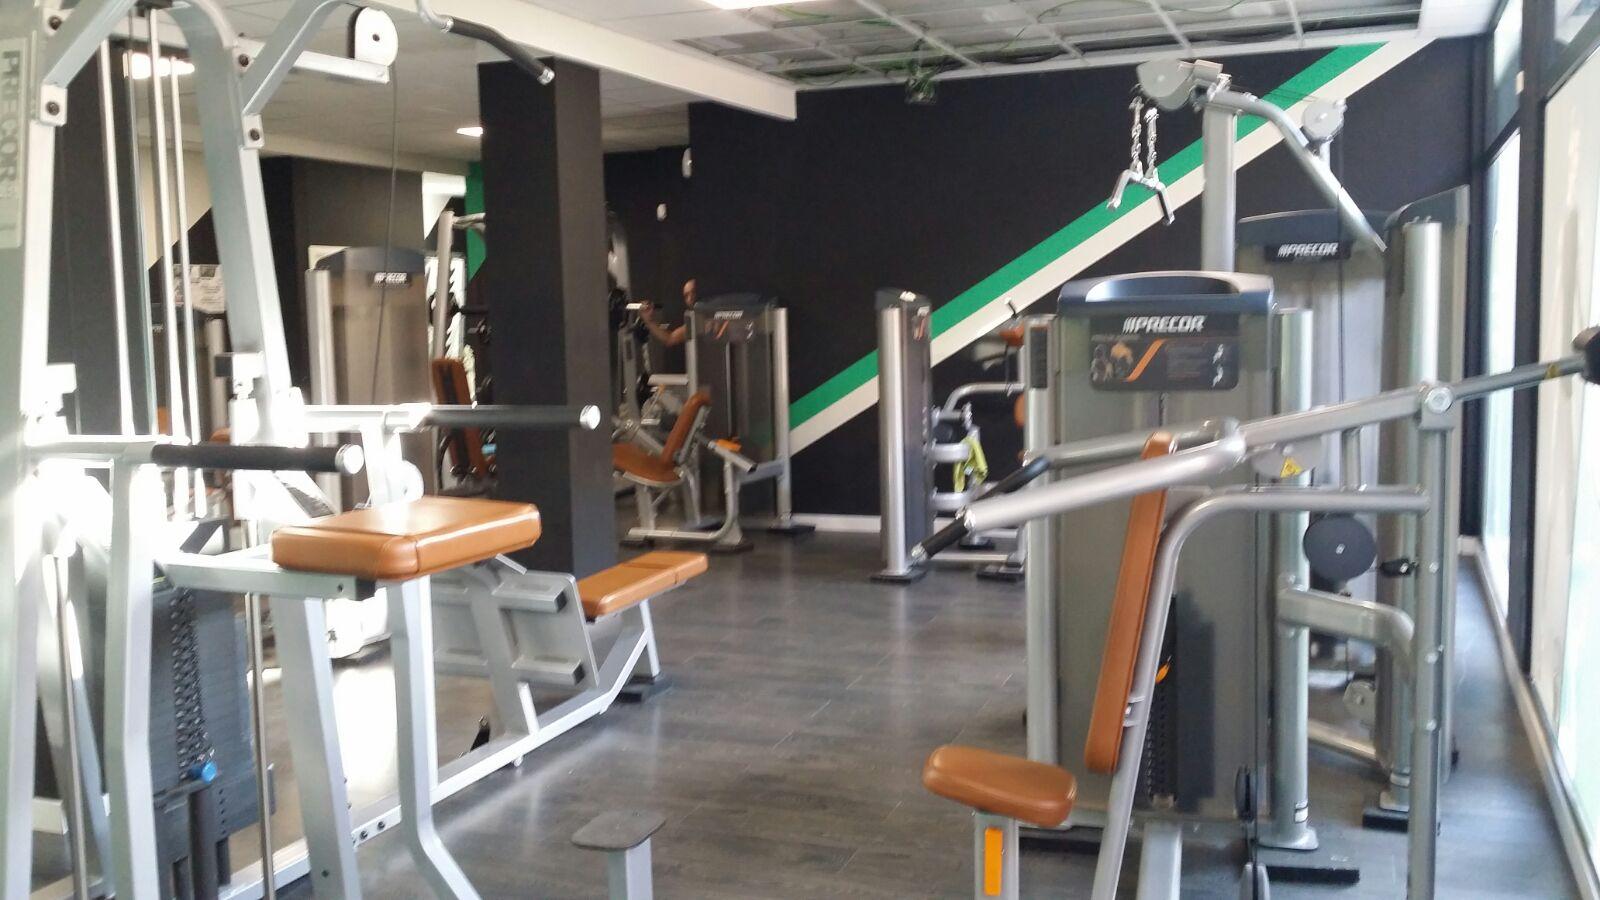 Foto 2 Oferta Gimnasio WUW Fitness El Prat El Prat de Llobregat - GymForLess